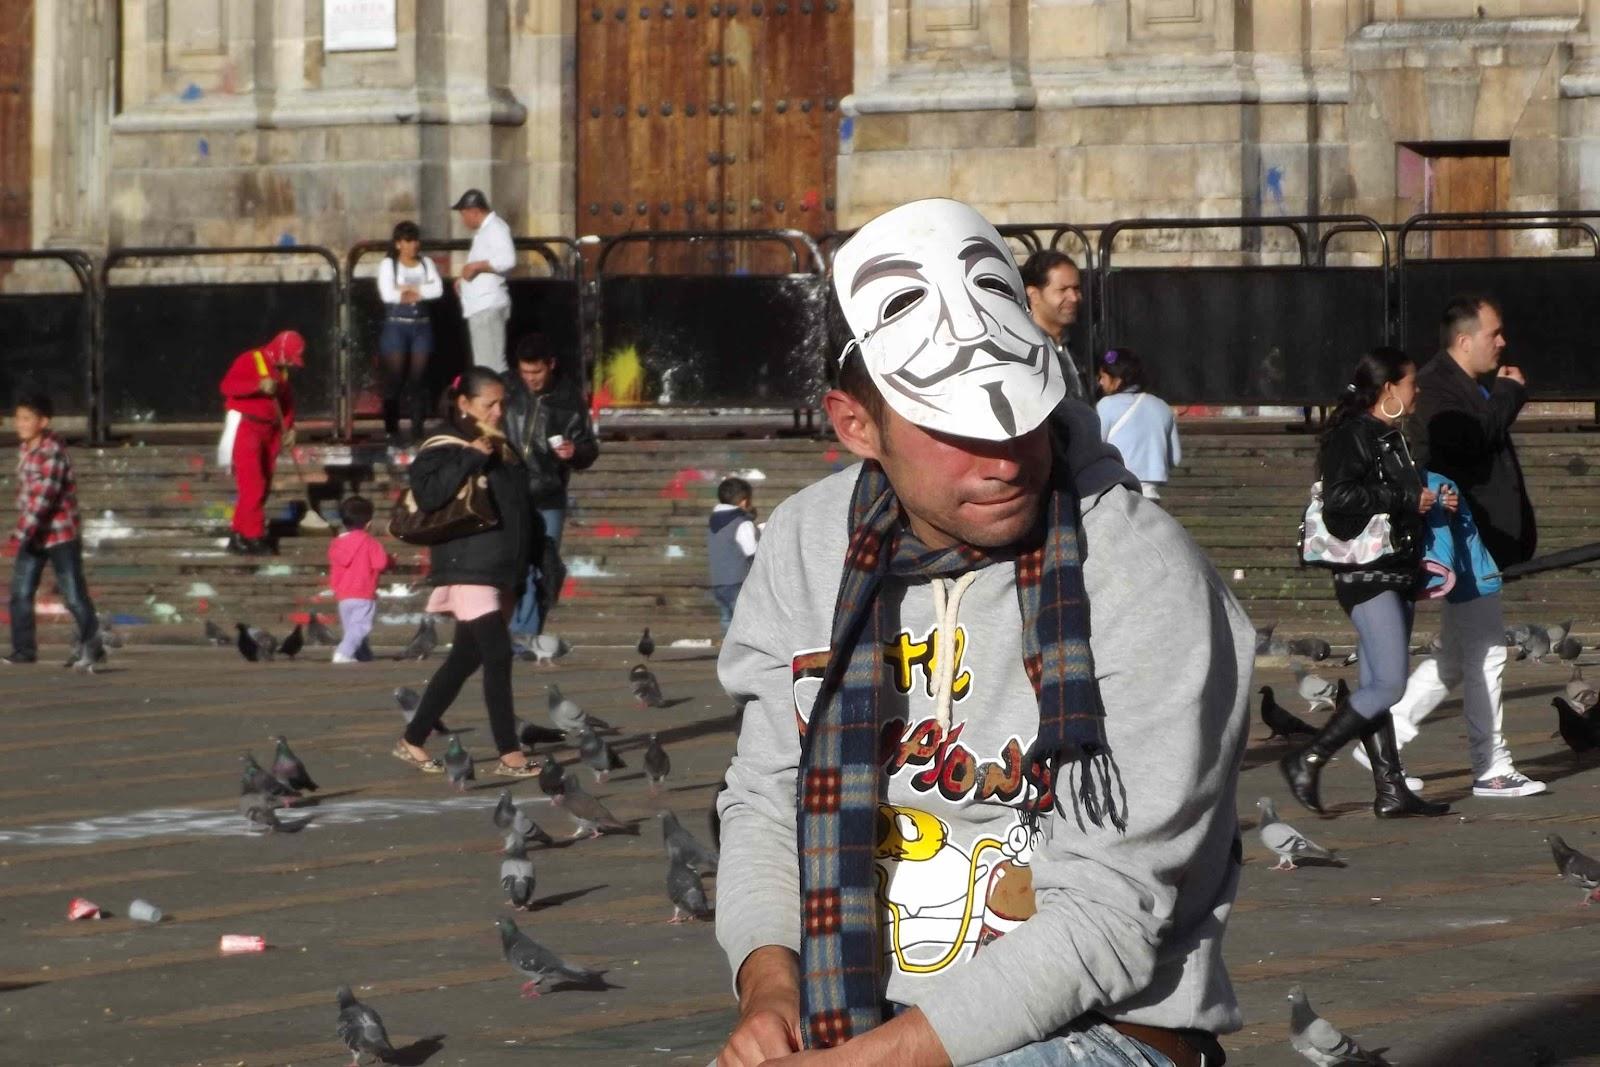 http://3.bp.blogspot.com/-DsDClbB7Jww/T6CZnrtBNcI/AAAAAAAAHcI/qxJrEwIPiz0/s1600/guy+fawkes+masked+man.JPG